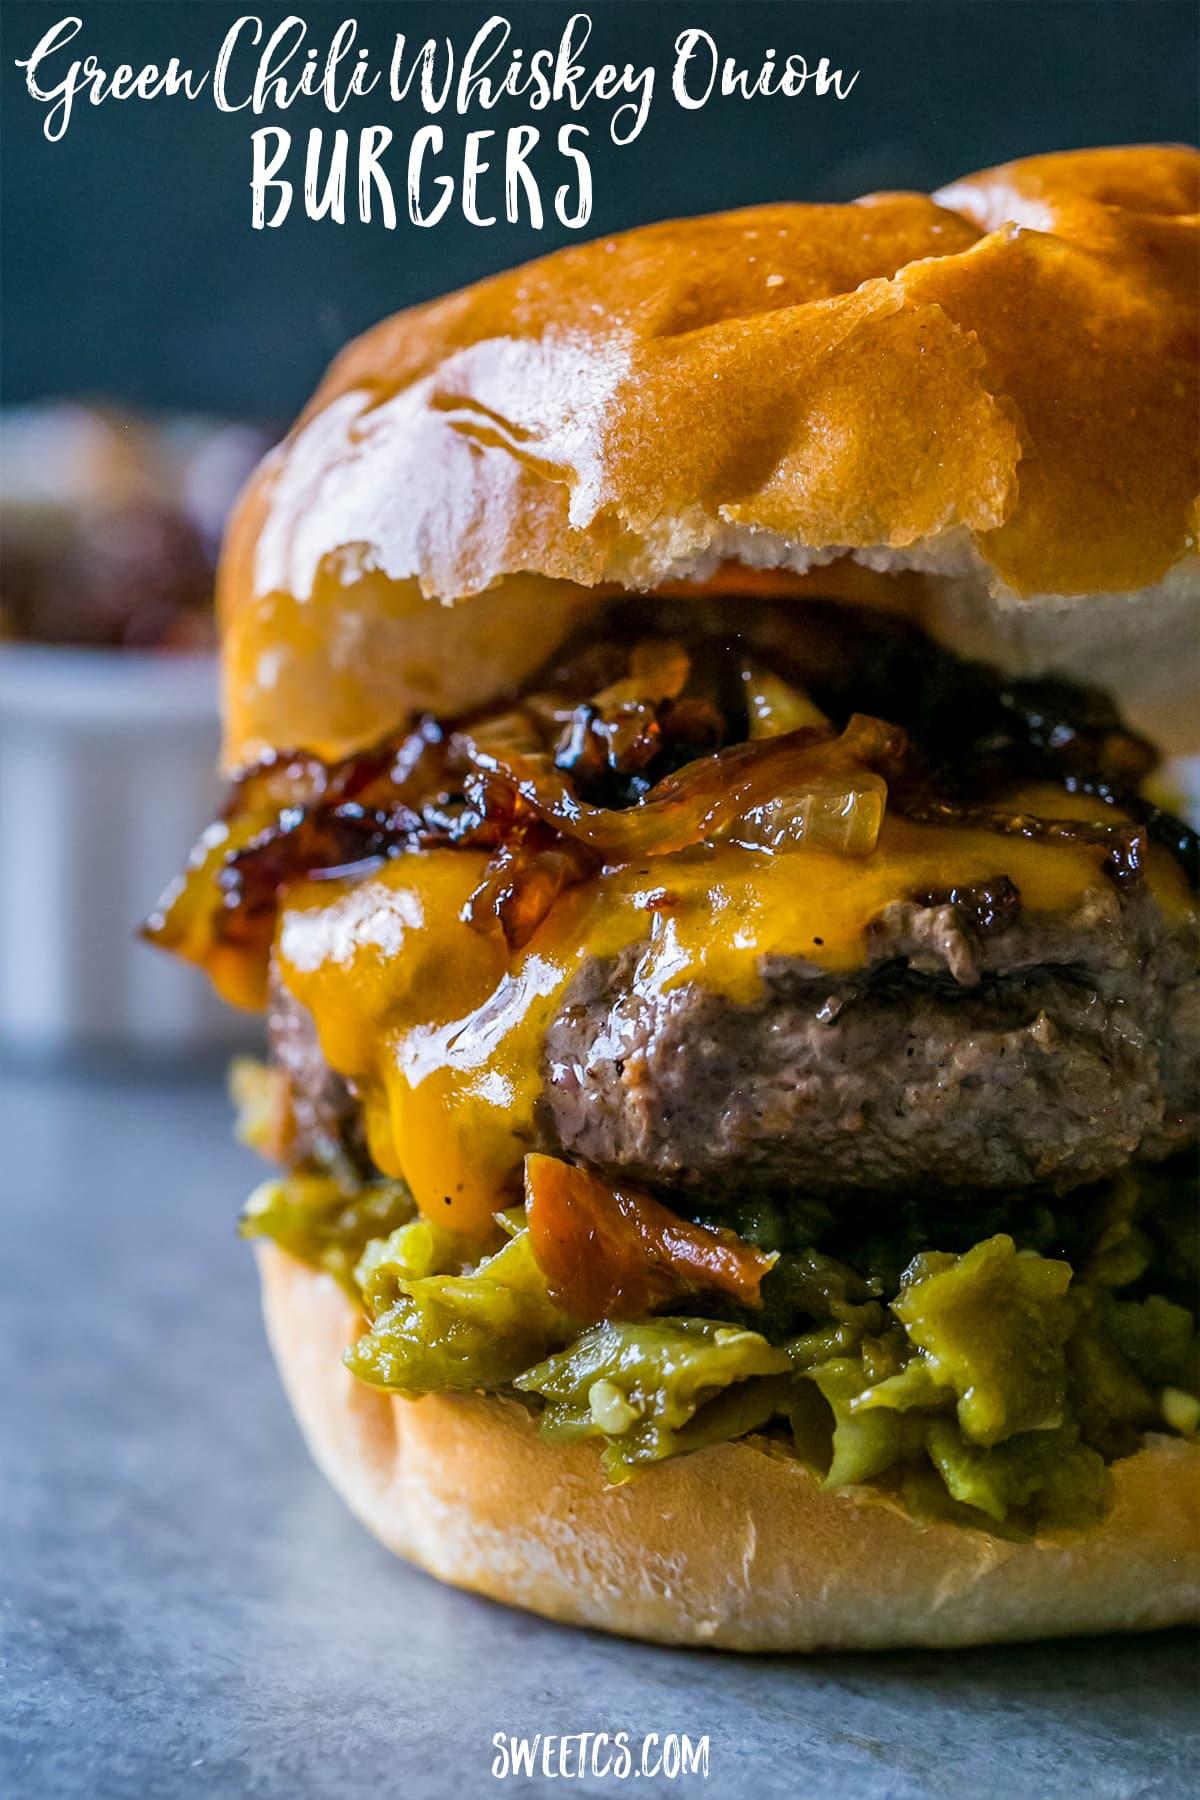 Green Chili Whiskey Onion Burgers {Sweet C's}